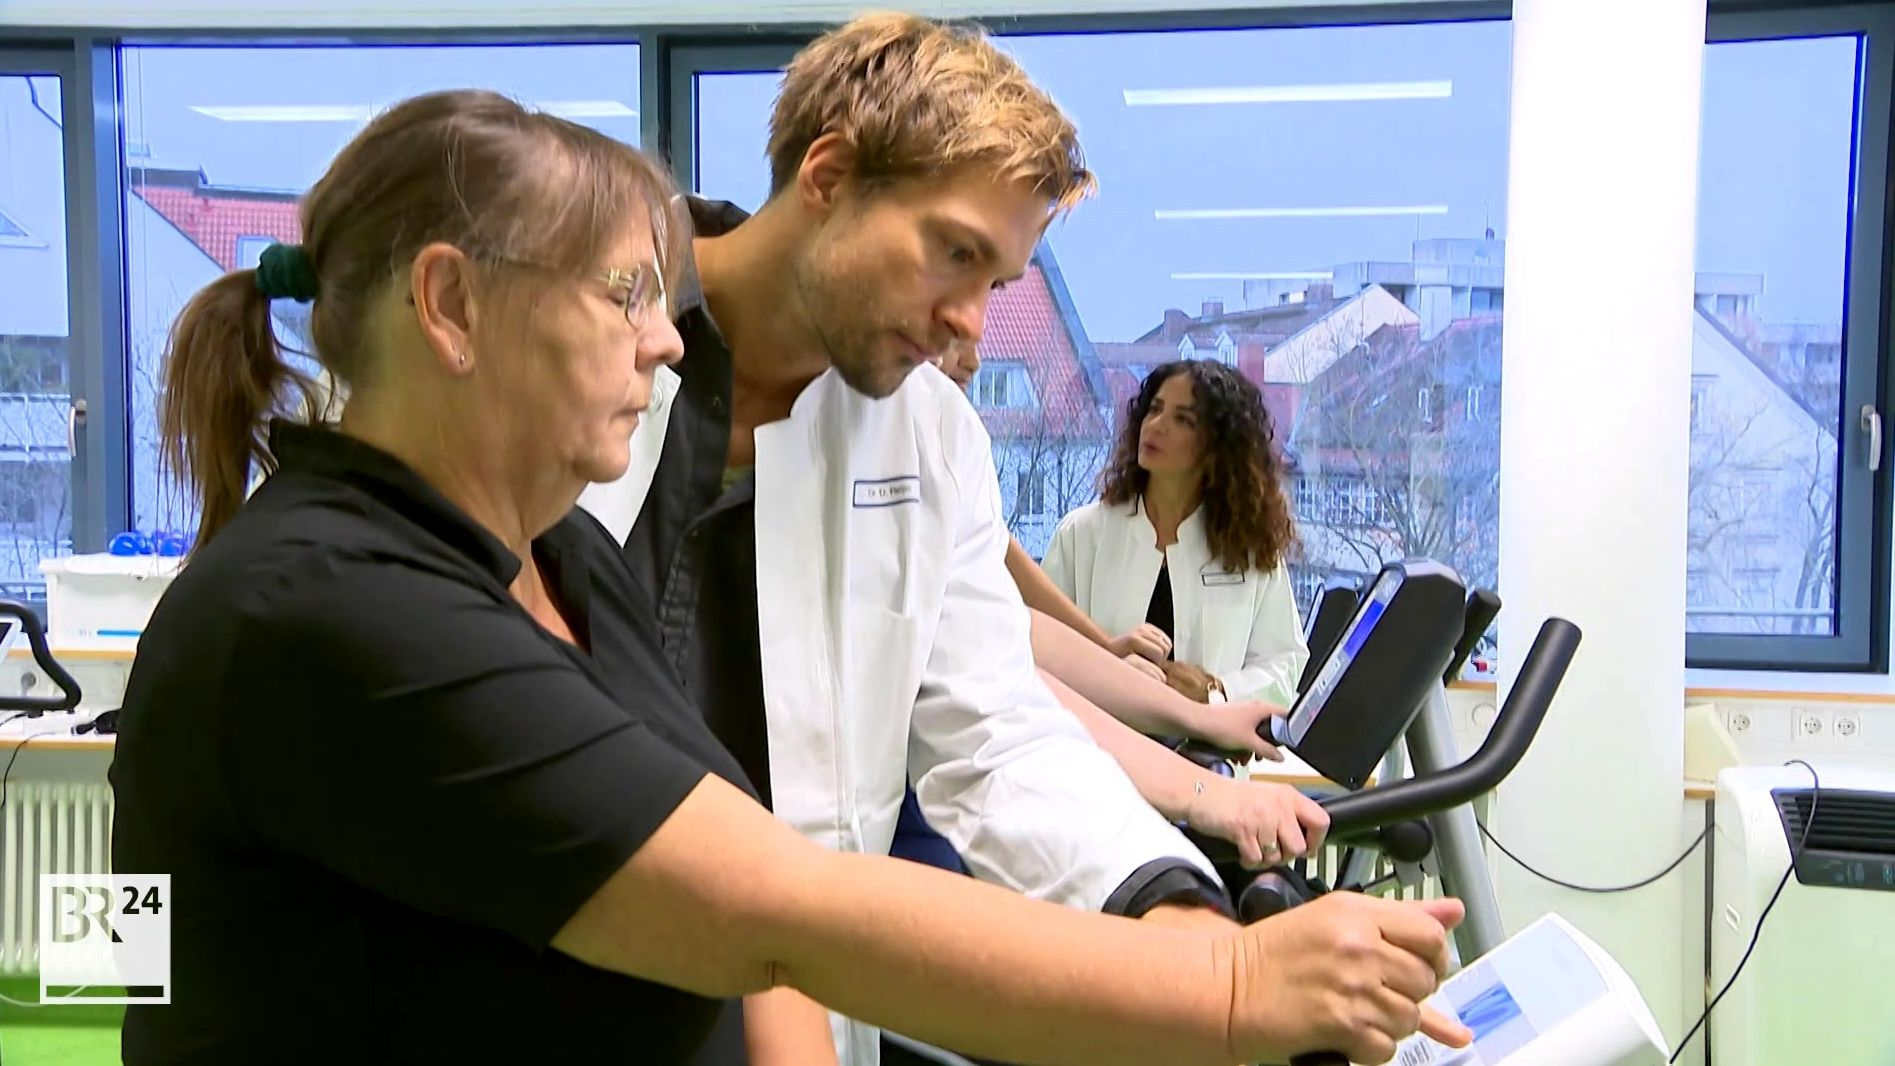 Dr. Dejan Reljic Sportwissenschaftler an der Uniklinik Erlangen